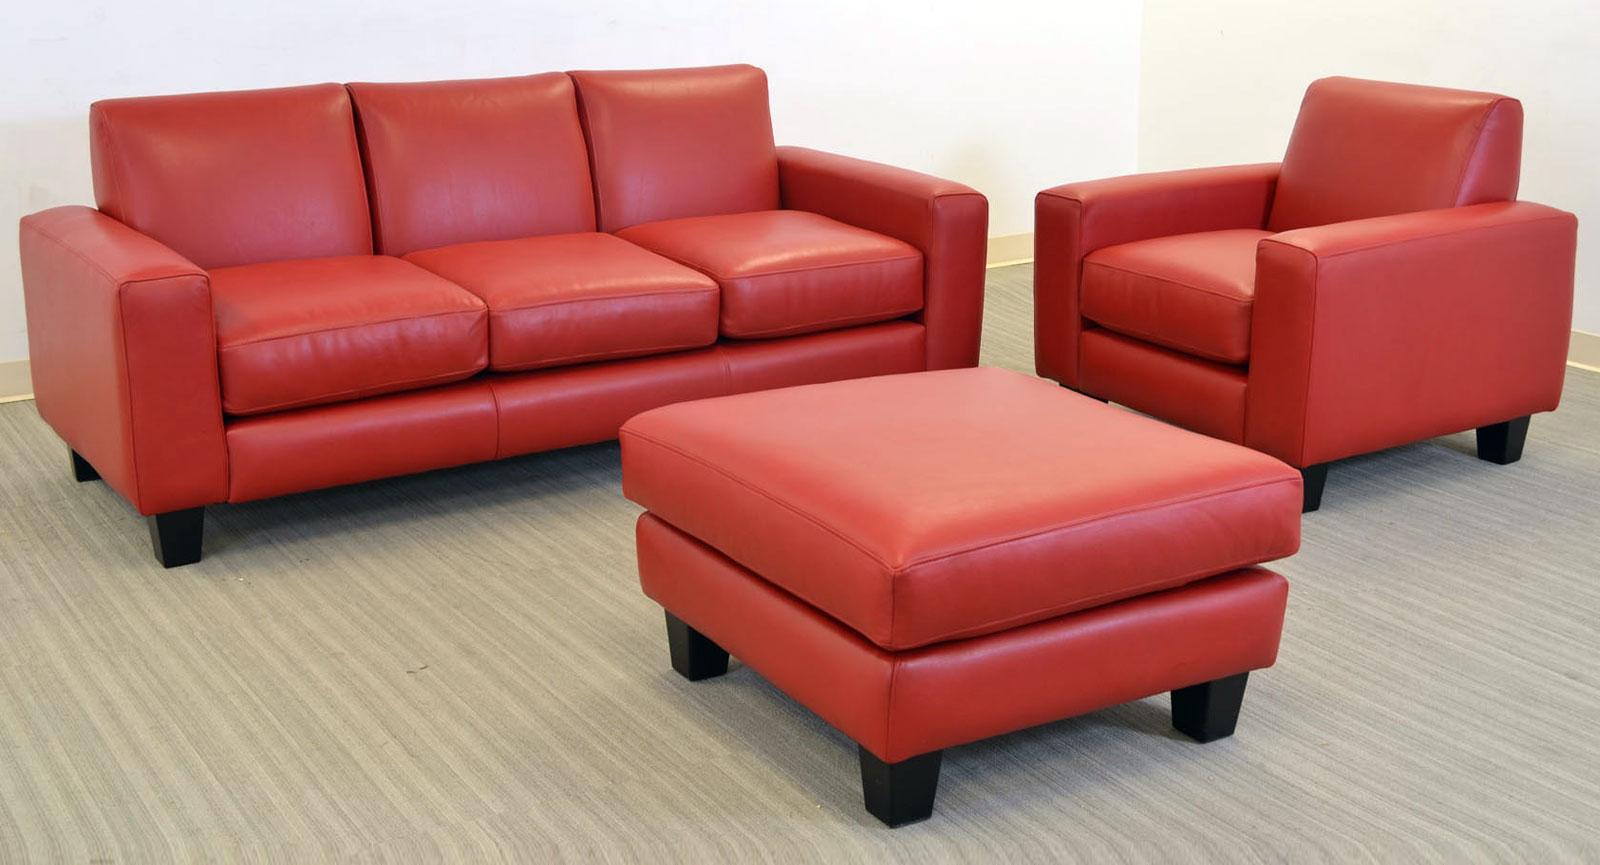 Elegante Sofa 3 Seat Chair Square Ottoman